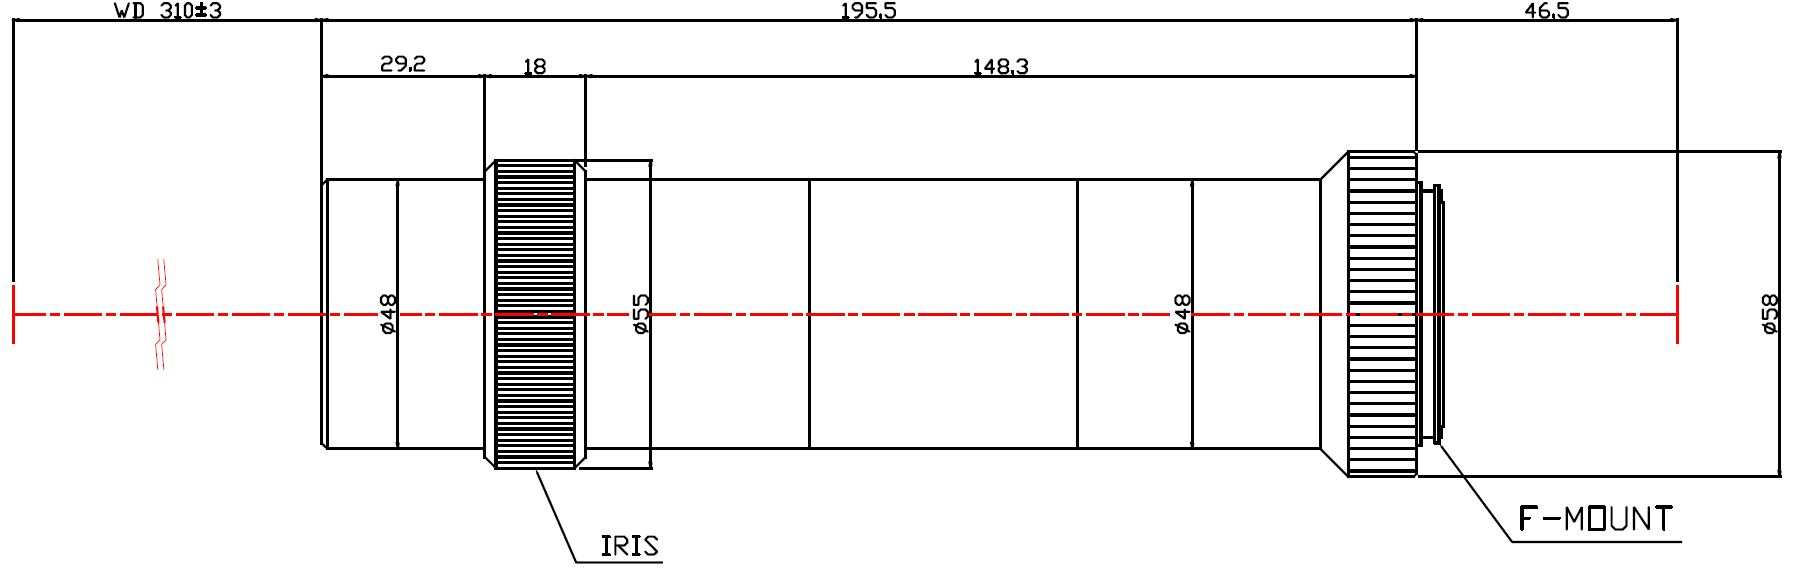 Lensagon MF8M-063-310I